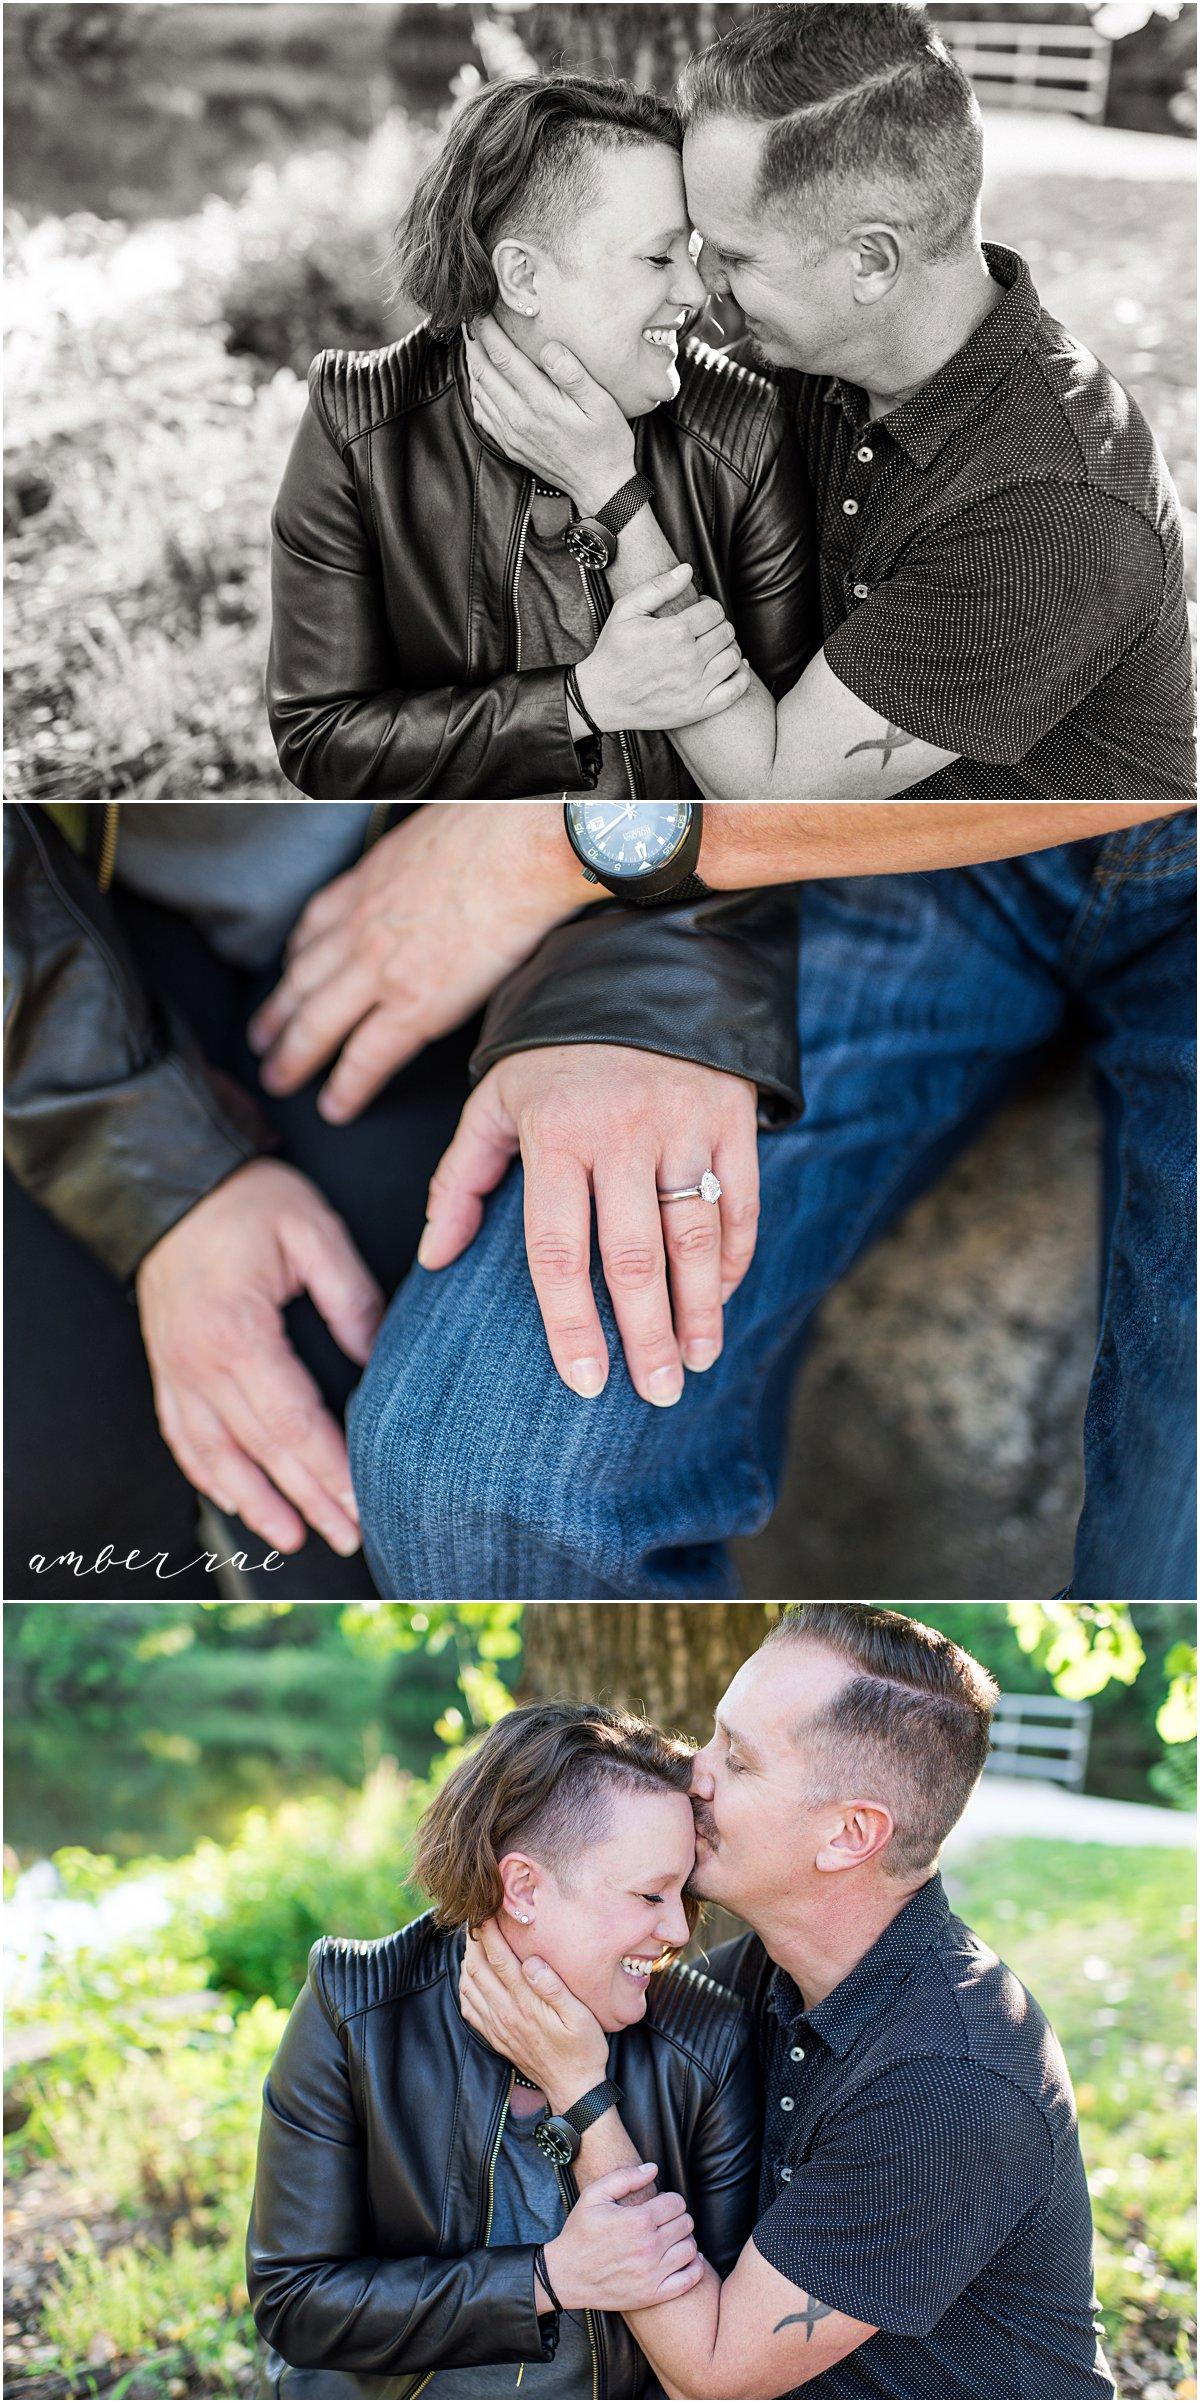 Lance and Amber Engagement Sept 2018_0004.jpg